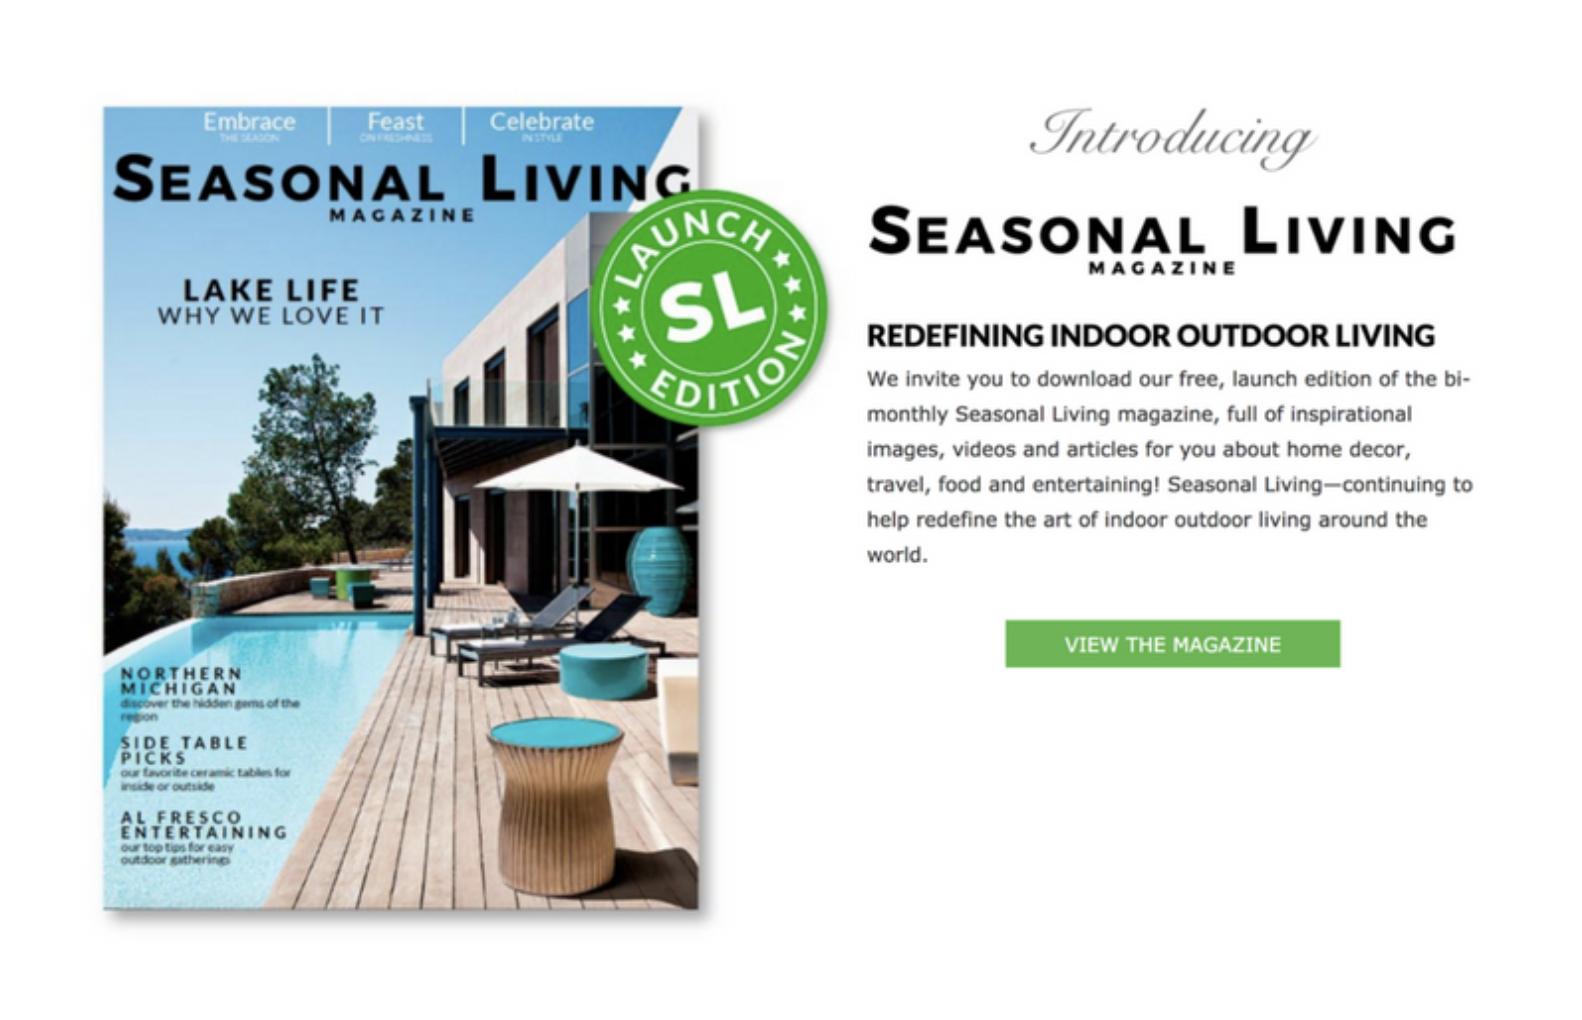 Click here to read the inaugural issue:  www.seasonalliving.com/seasonal-living-magazine